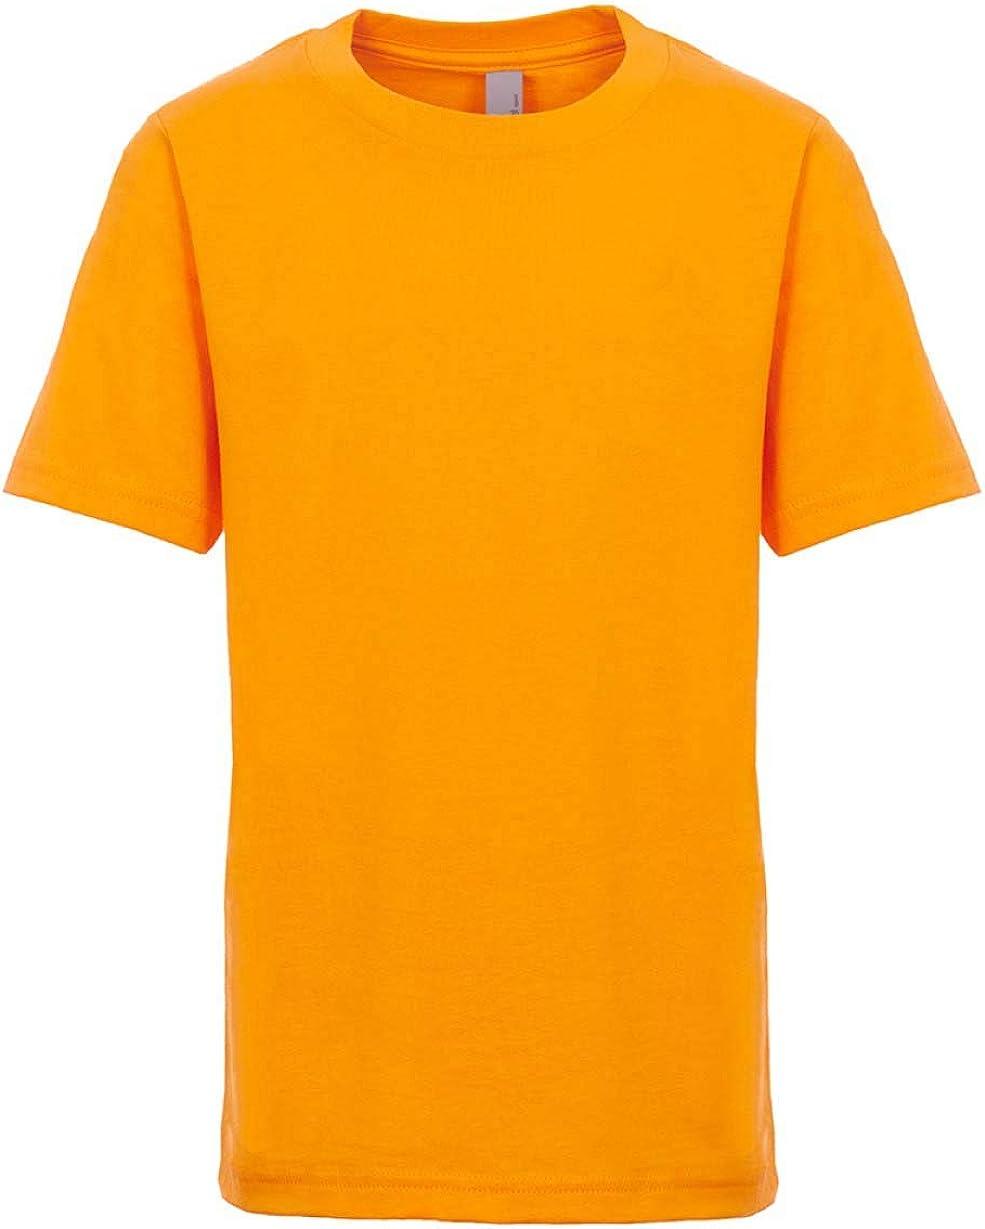 Next Level Kids Crew Neck T-Shirt Gold S